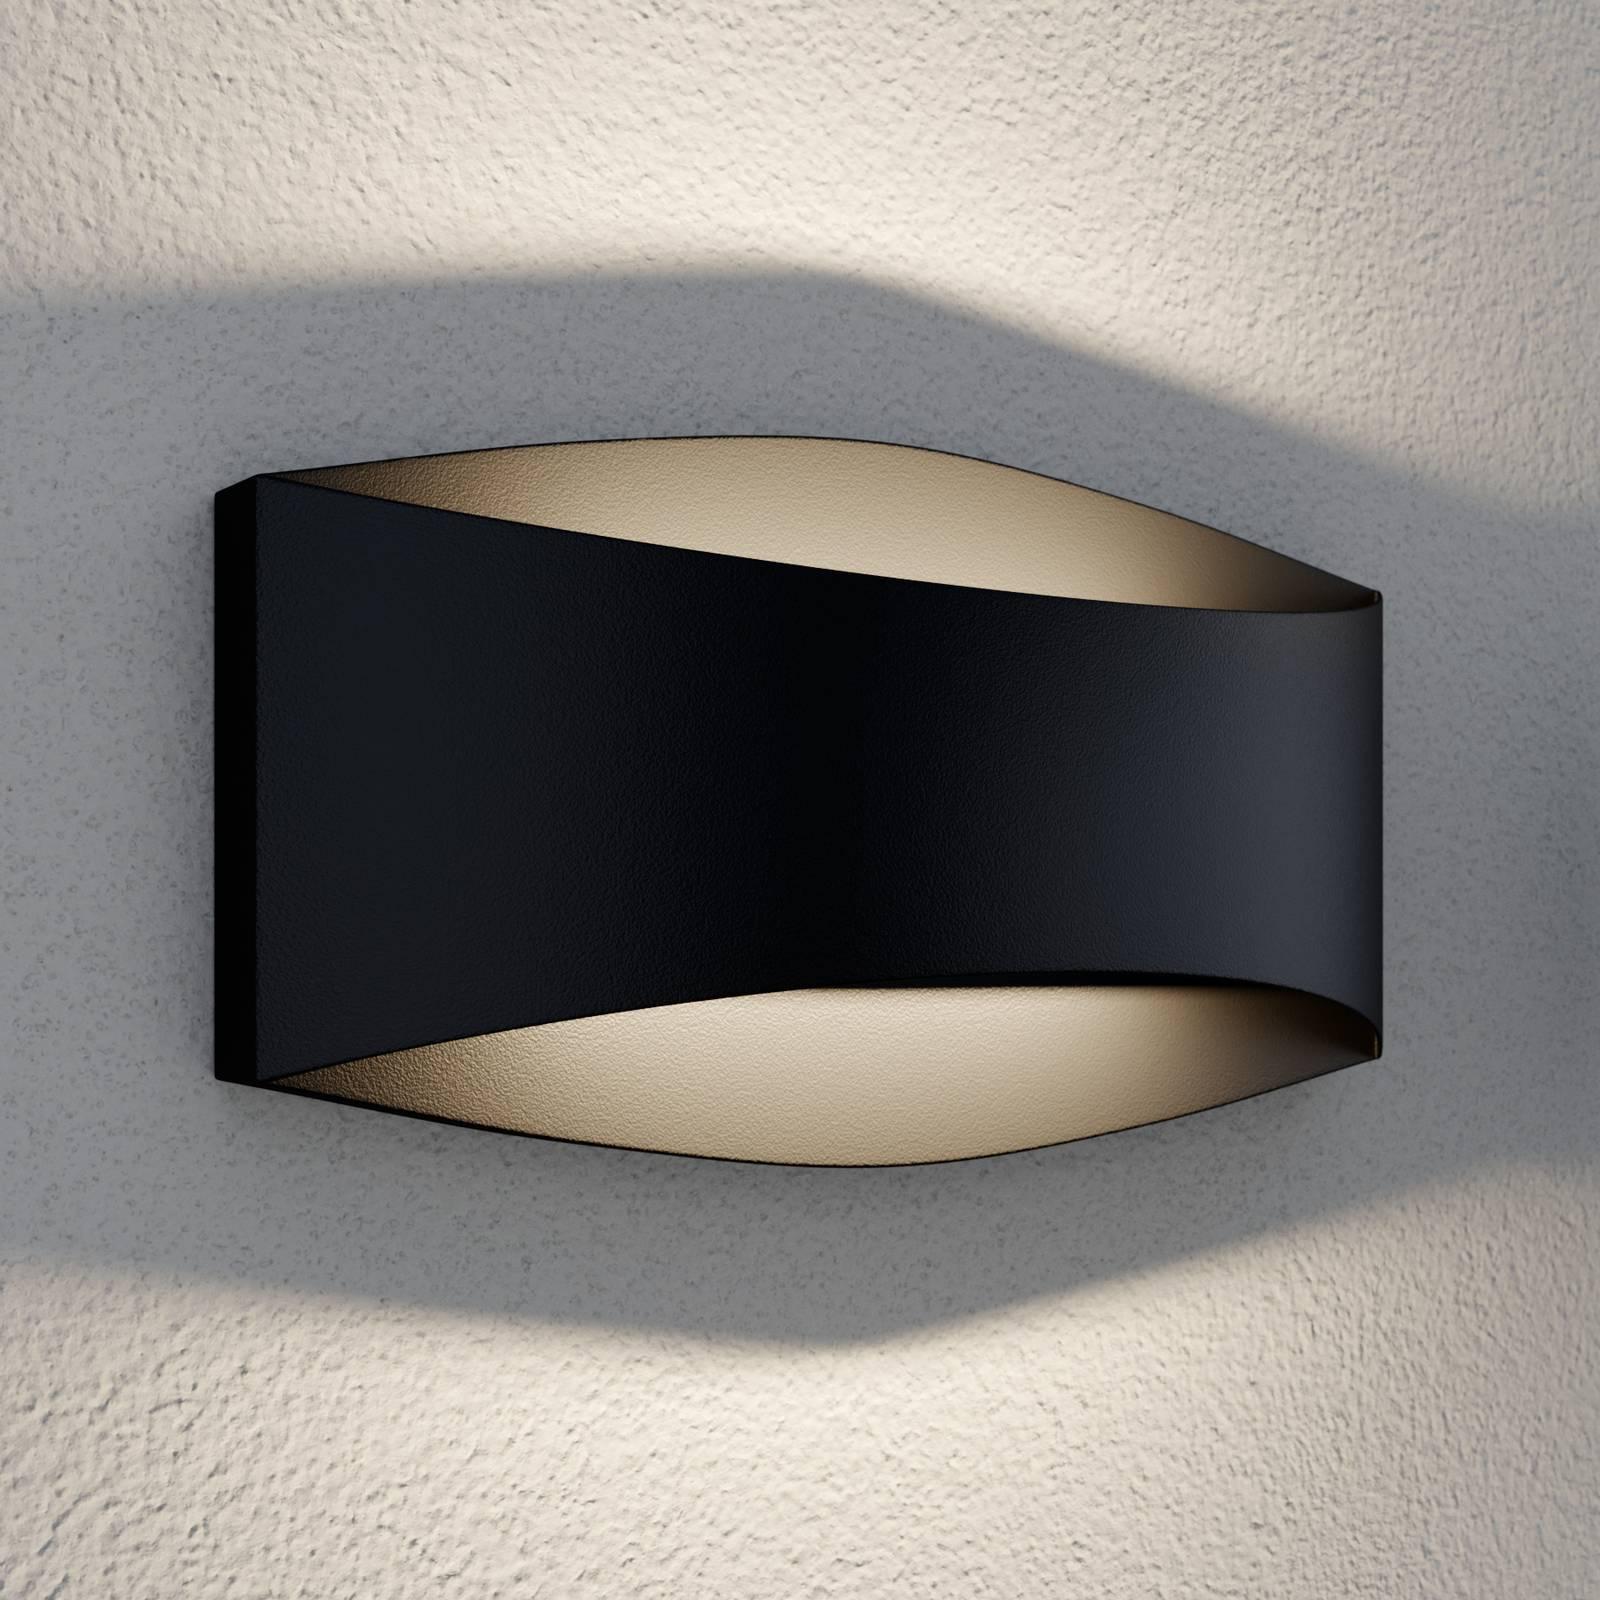 Lindby Evric -LED-ulkoseinävalaisin, 20,3 cm